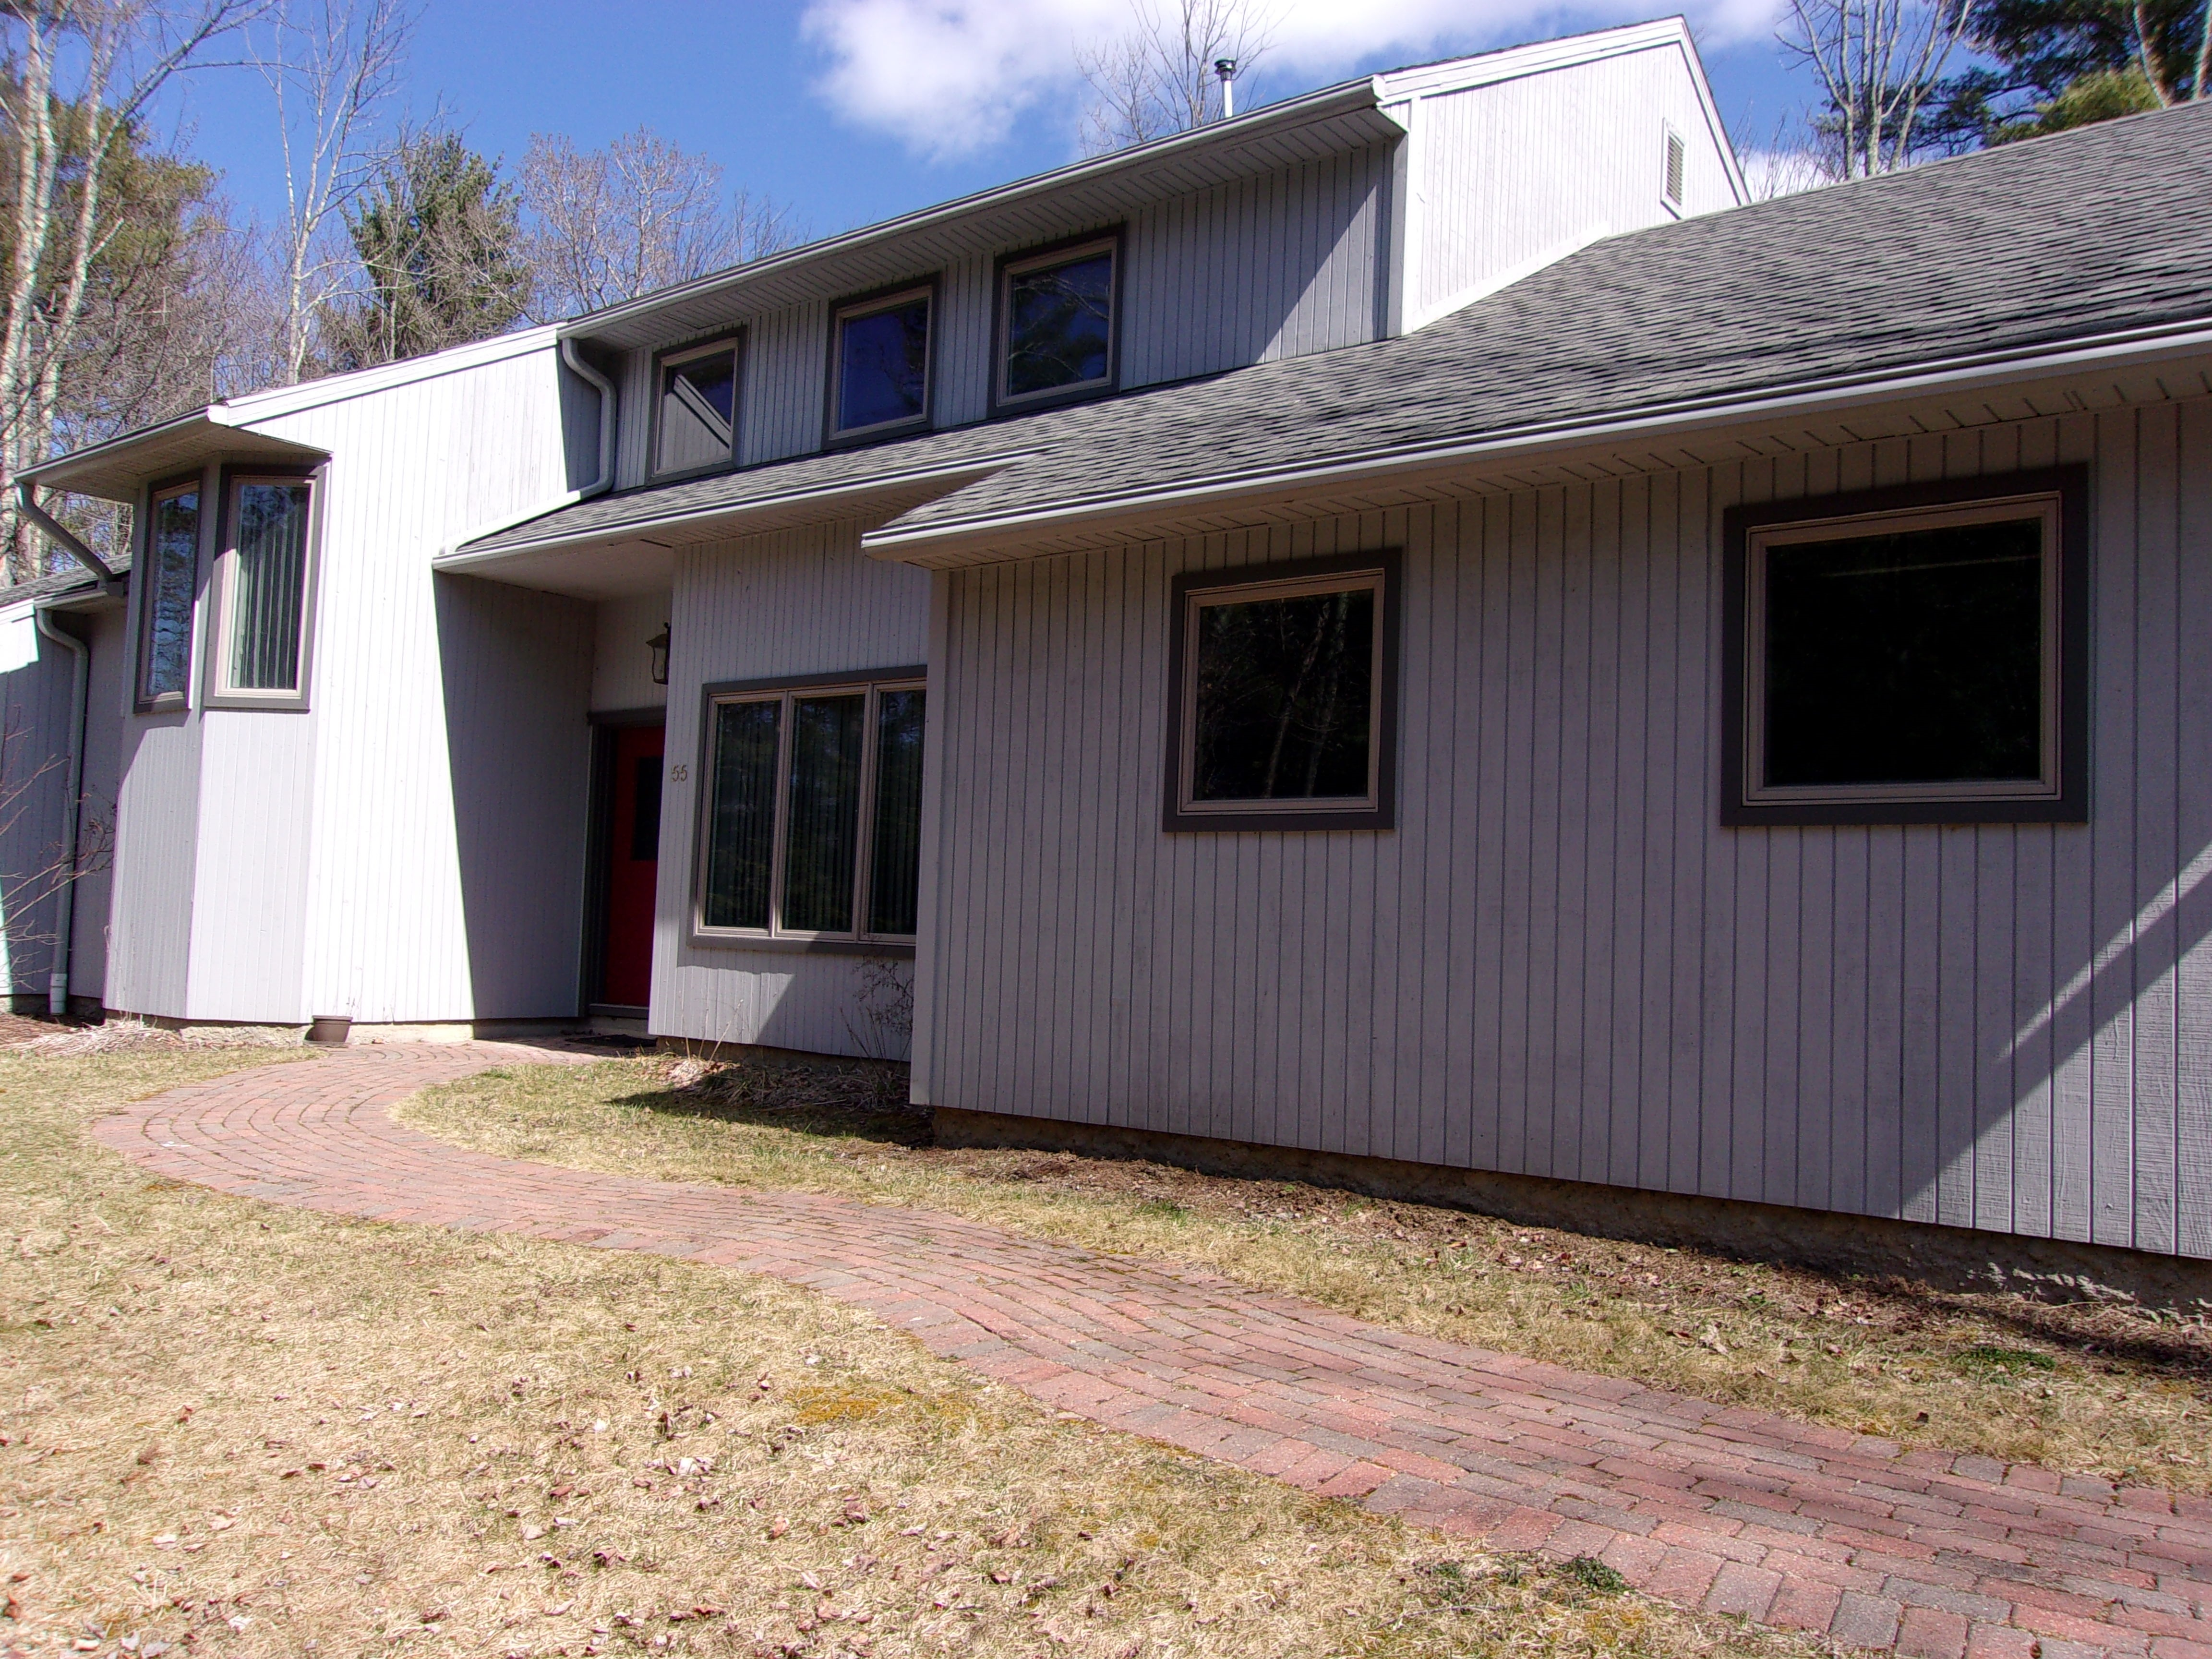 Single Family Home for Sale at Woodridge Lake Single Level Living 55 Shelbourne Dr Goshen, Connecticut, 06756 United States